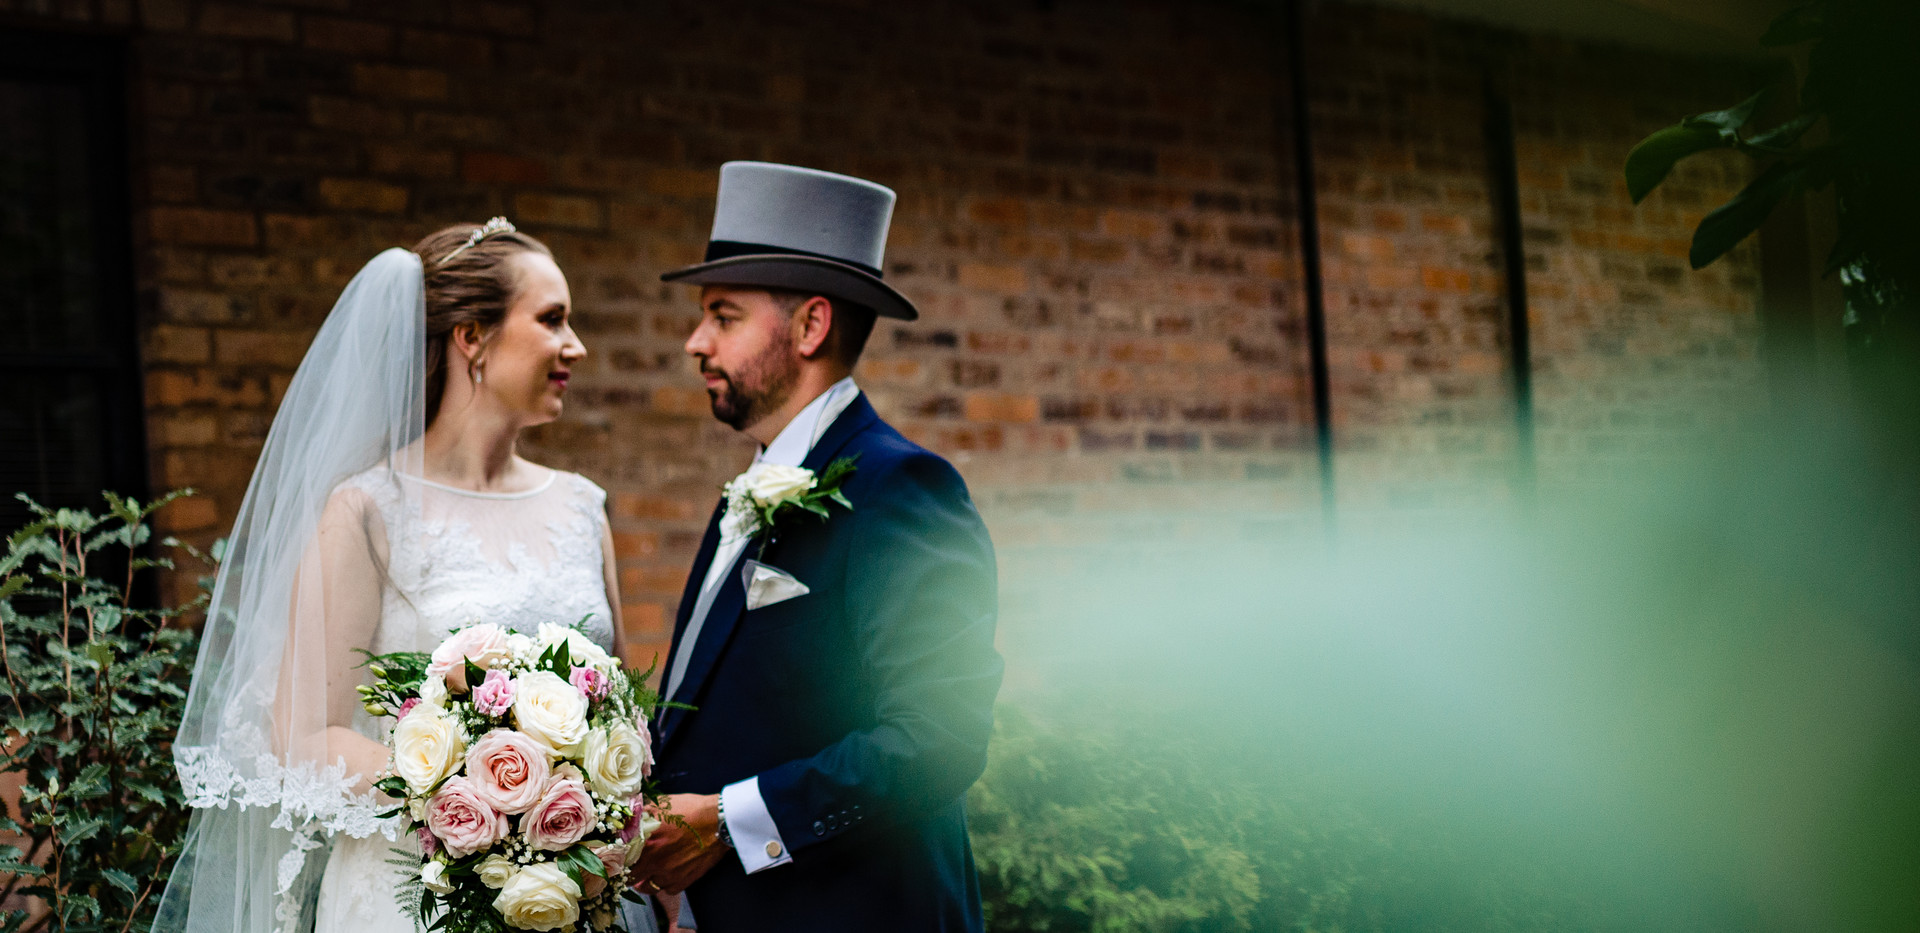 Oddfellows Wedding Photography___26.jpg